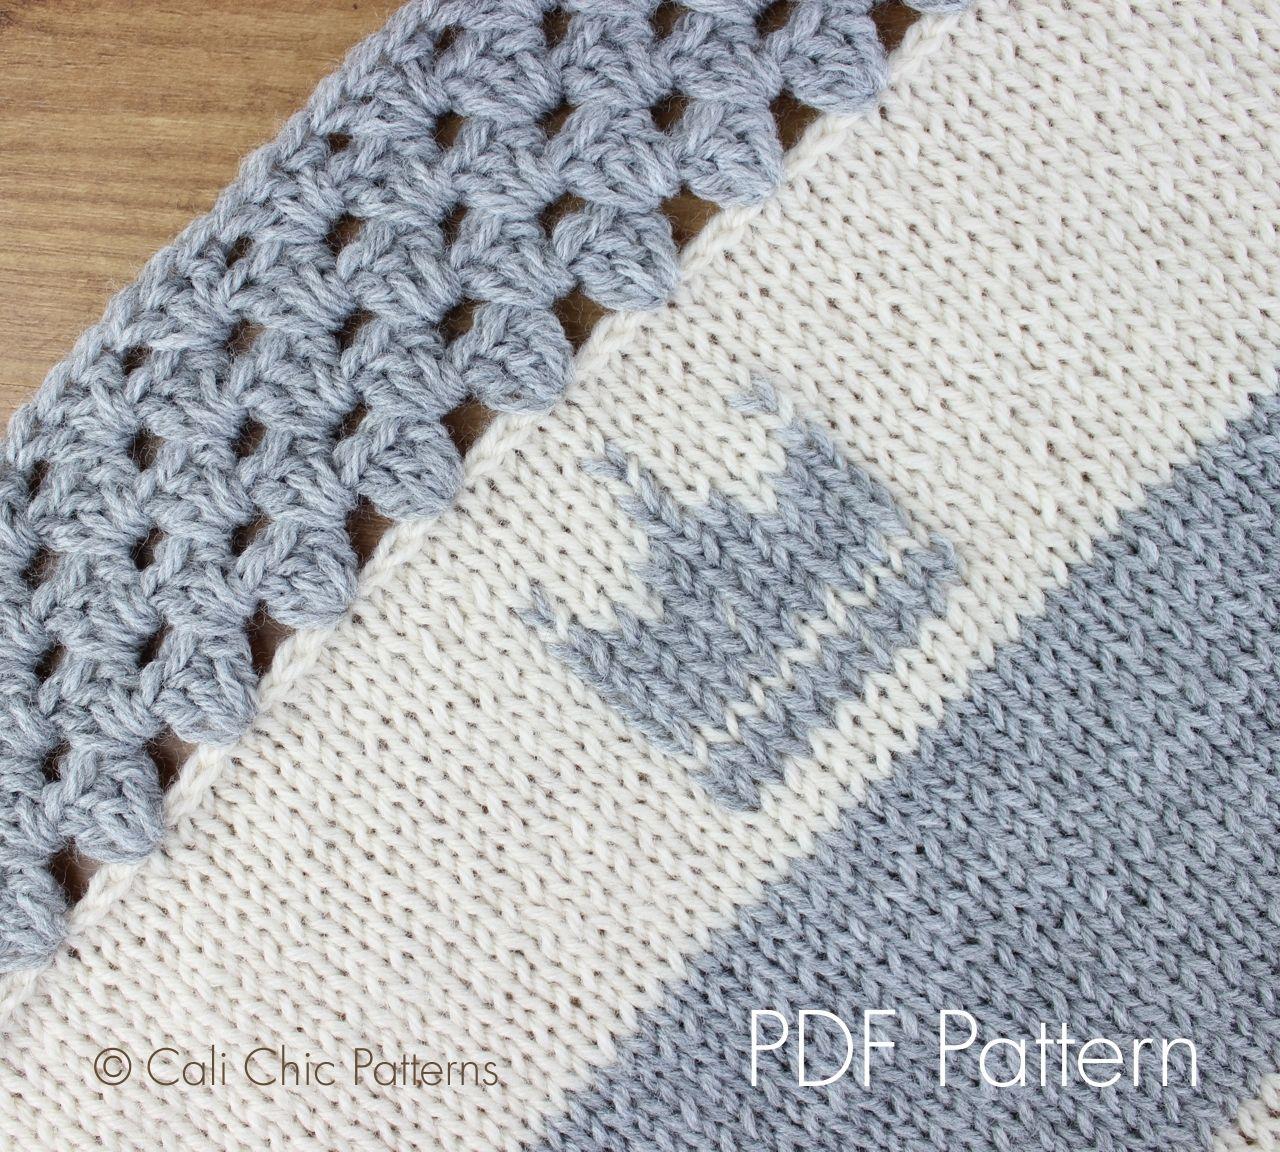 Cali Chic Patterns - Cali Kids - Knit Blanket PATTERN 27 , $5.00 ...